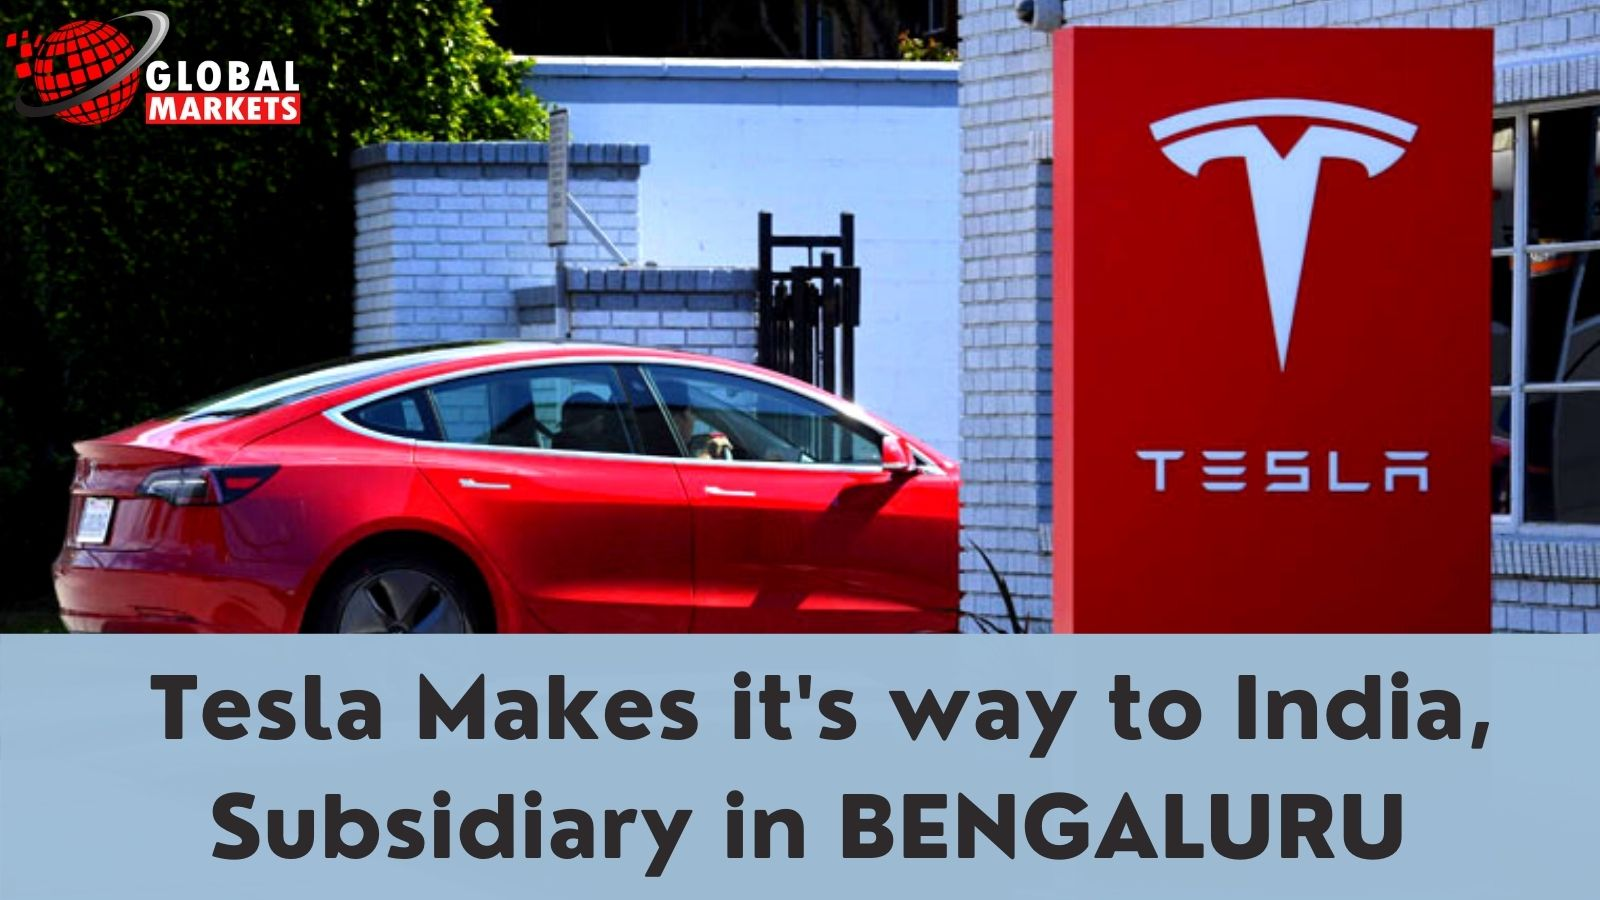 Tesla Makes it's way to India, Subsidiary in BENGALURU